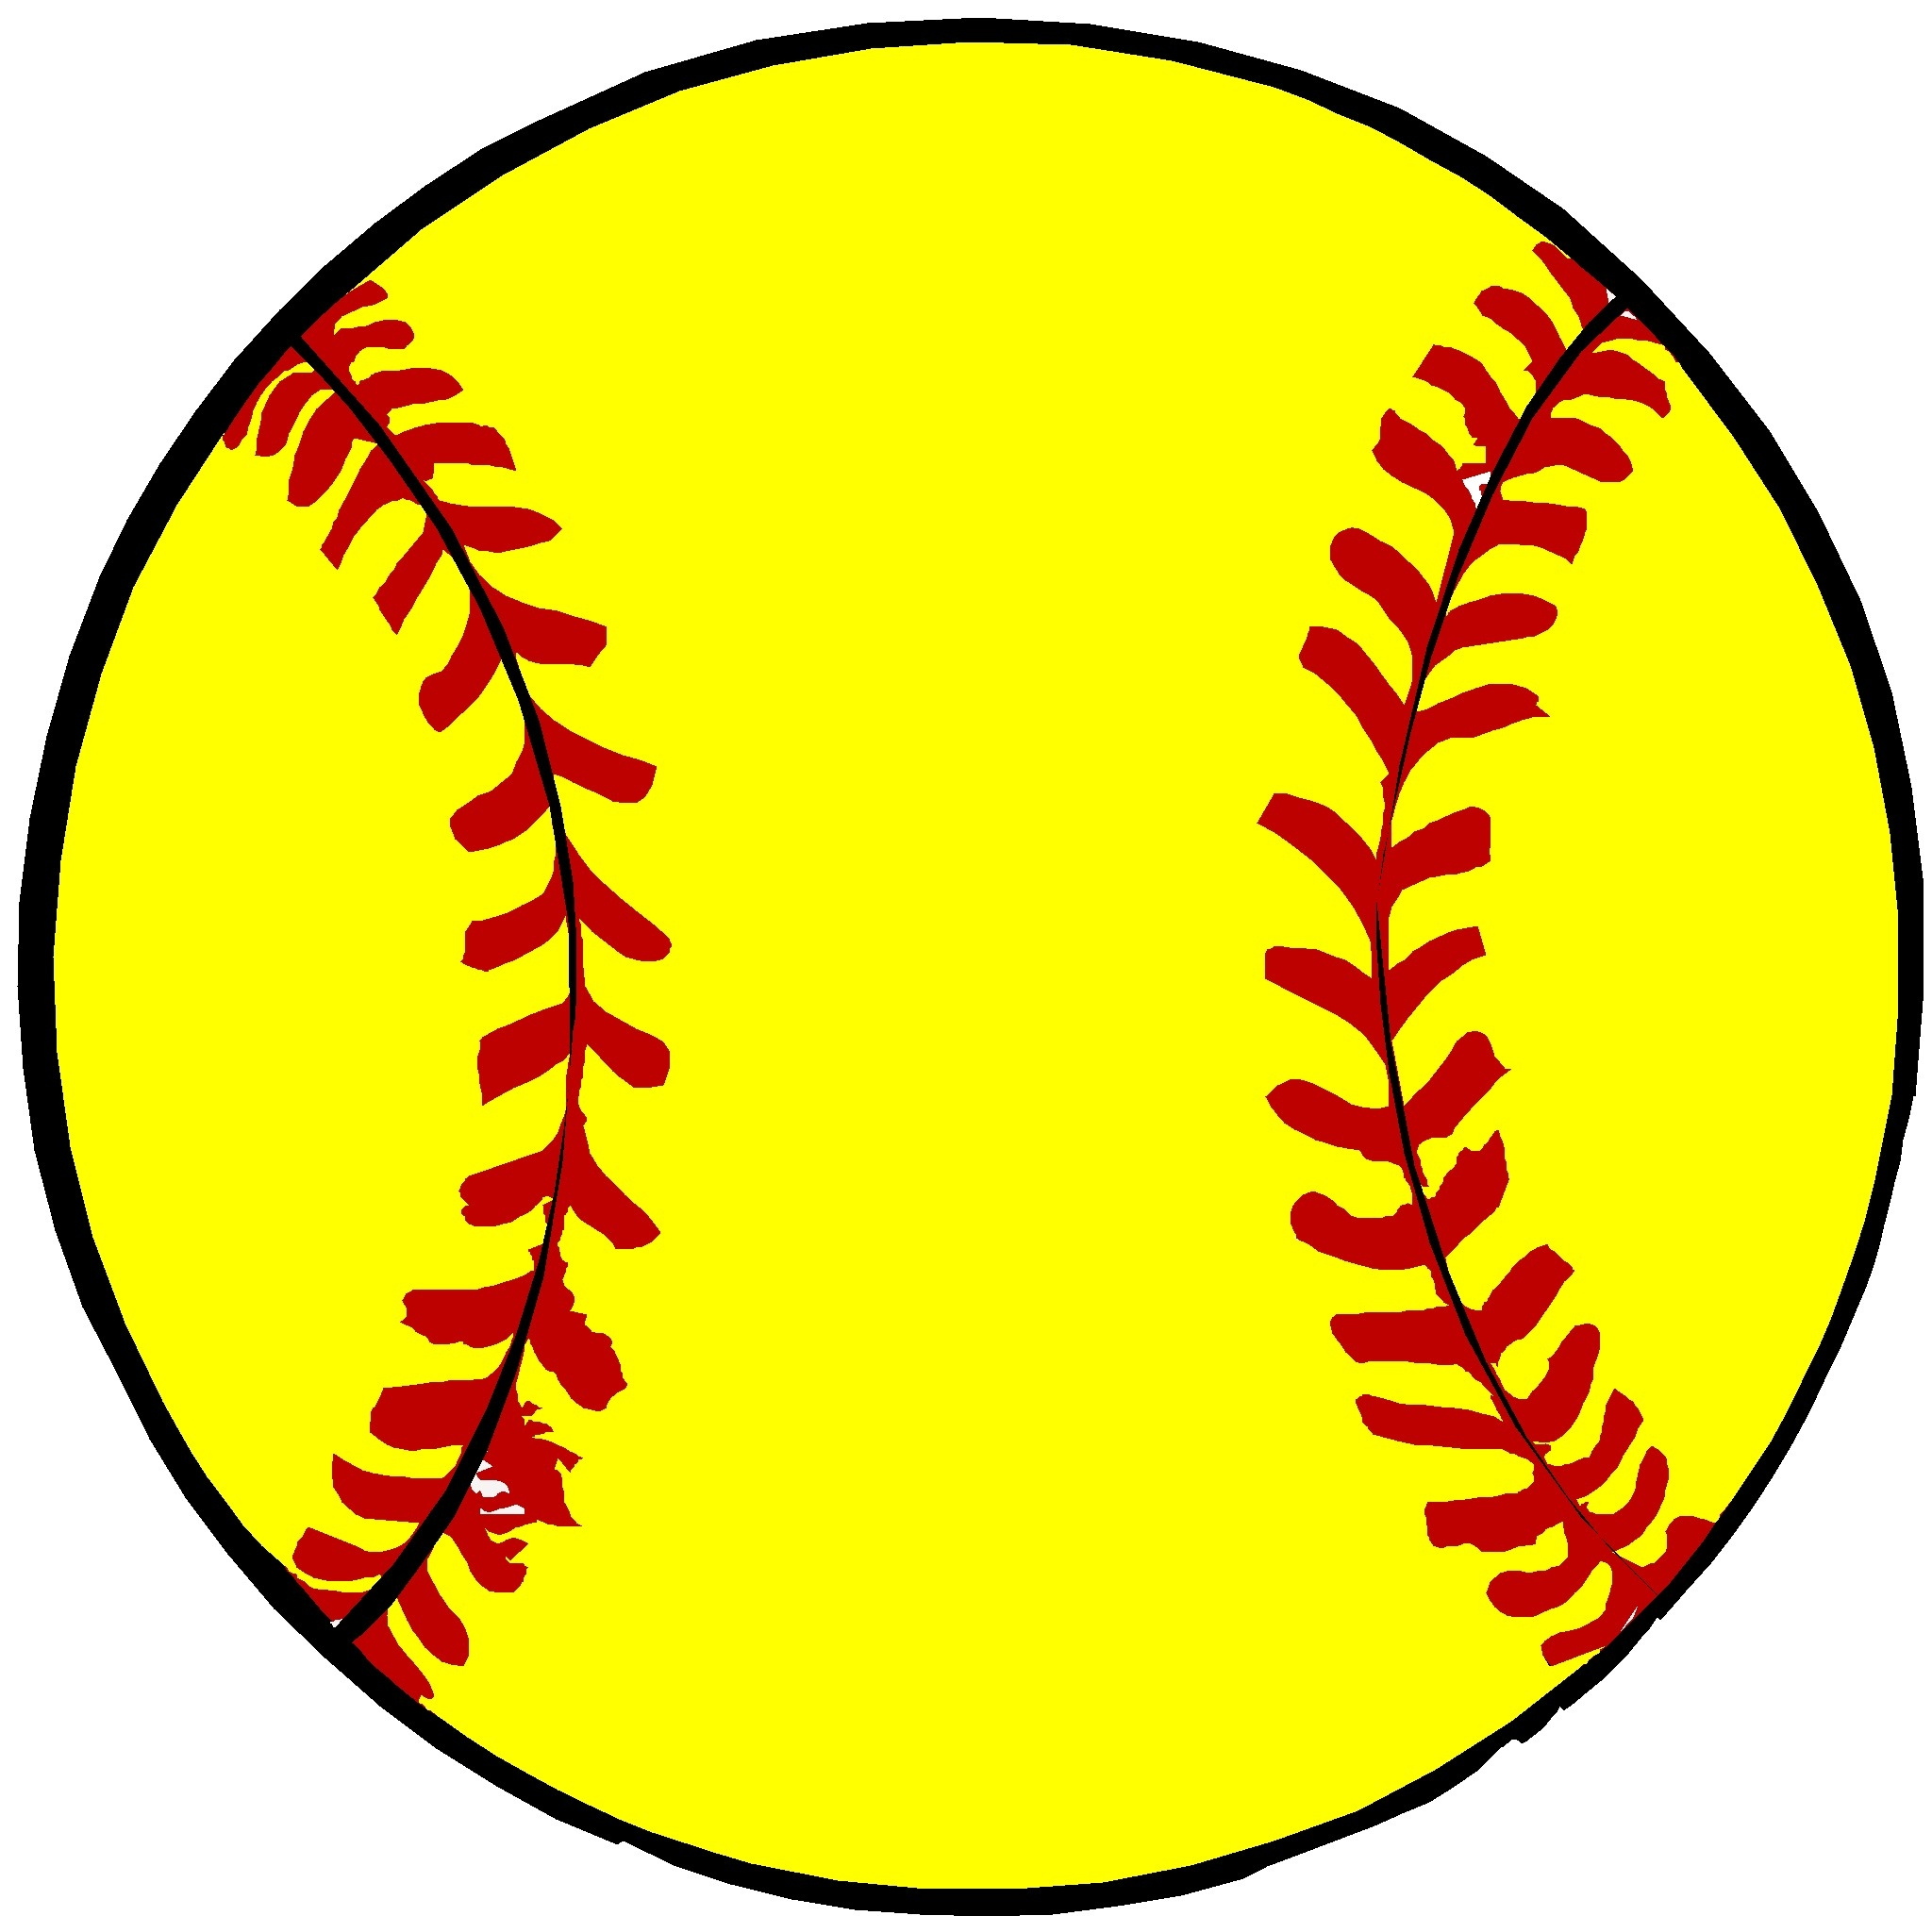 Softball clipart. New design digital collection